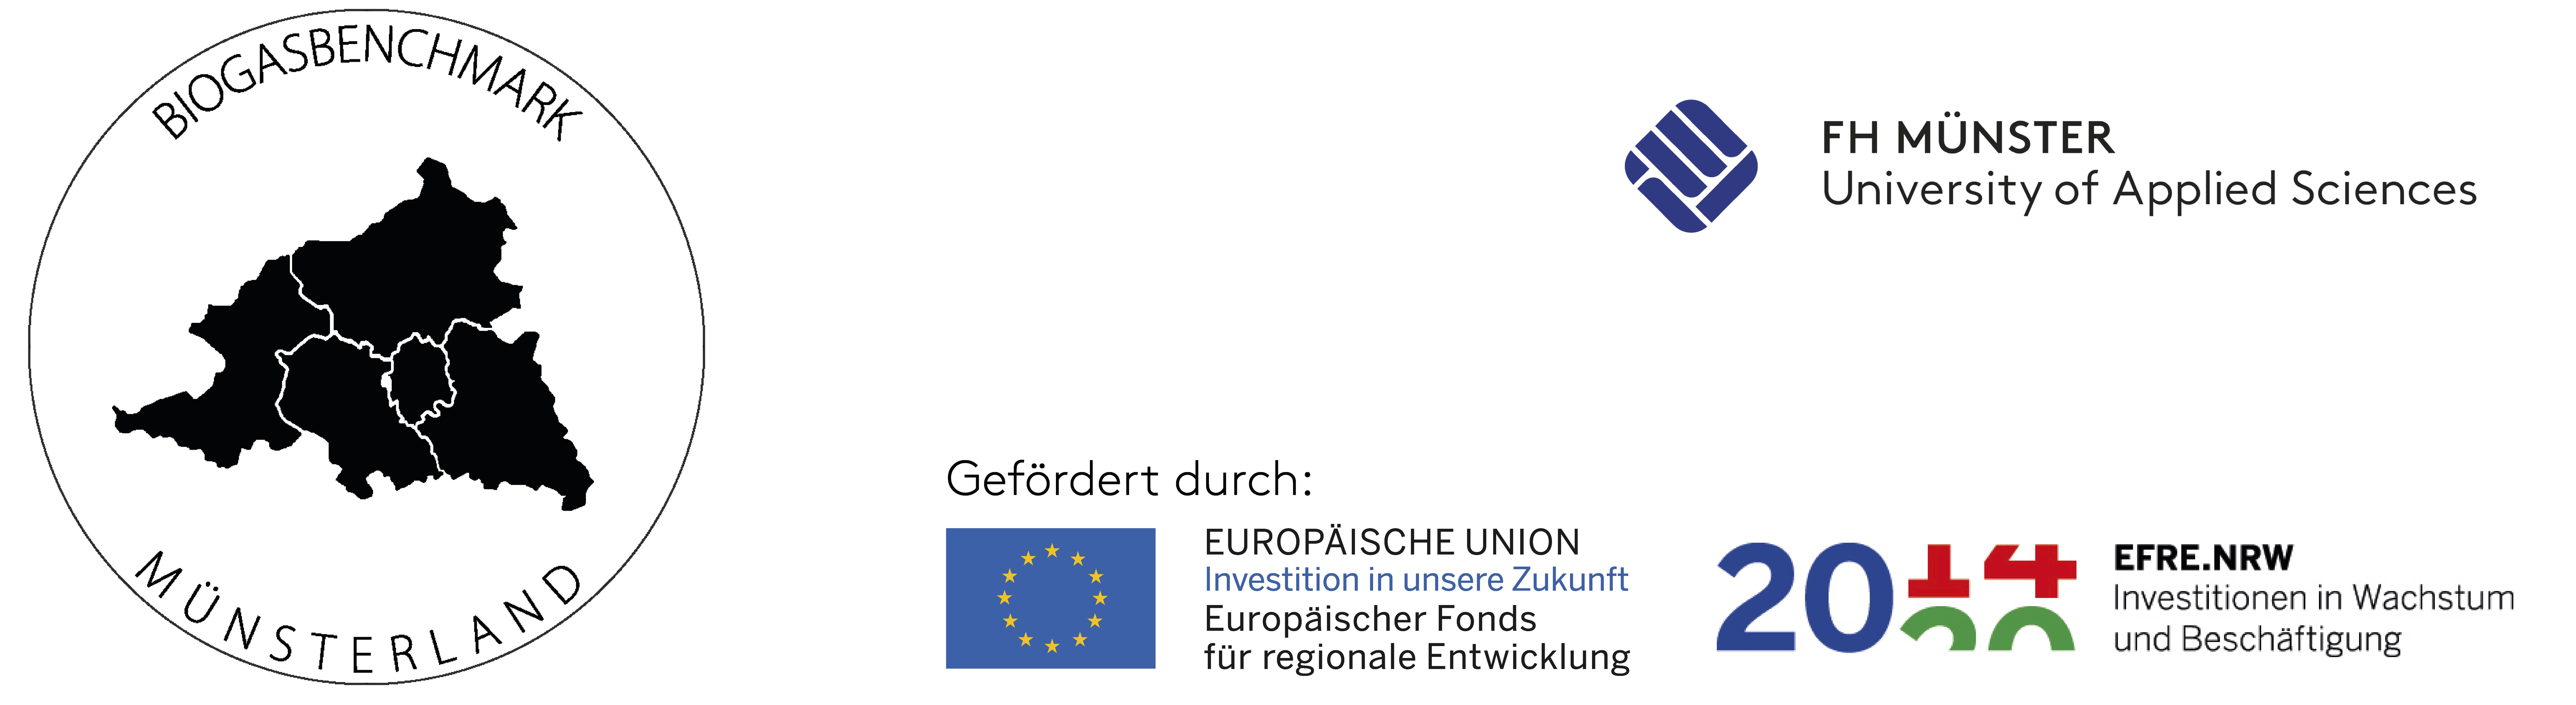 Biogasbenchmark Münsterland